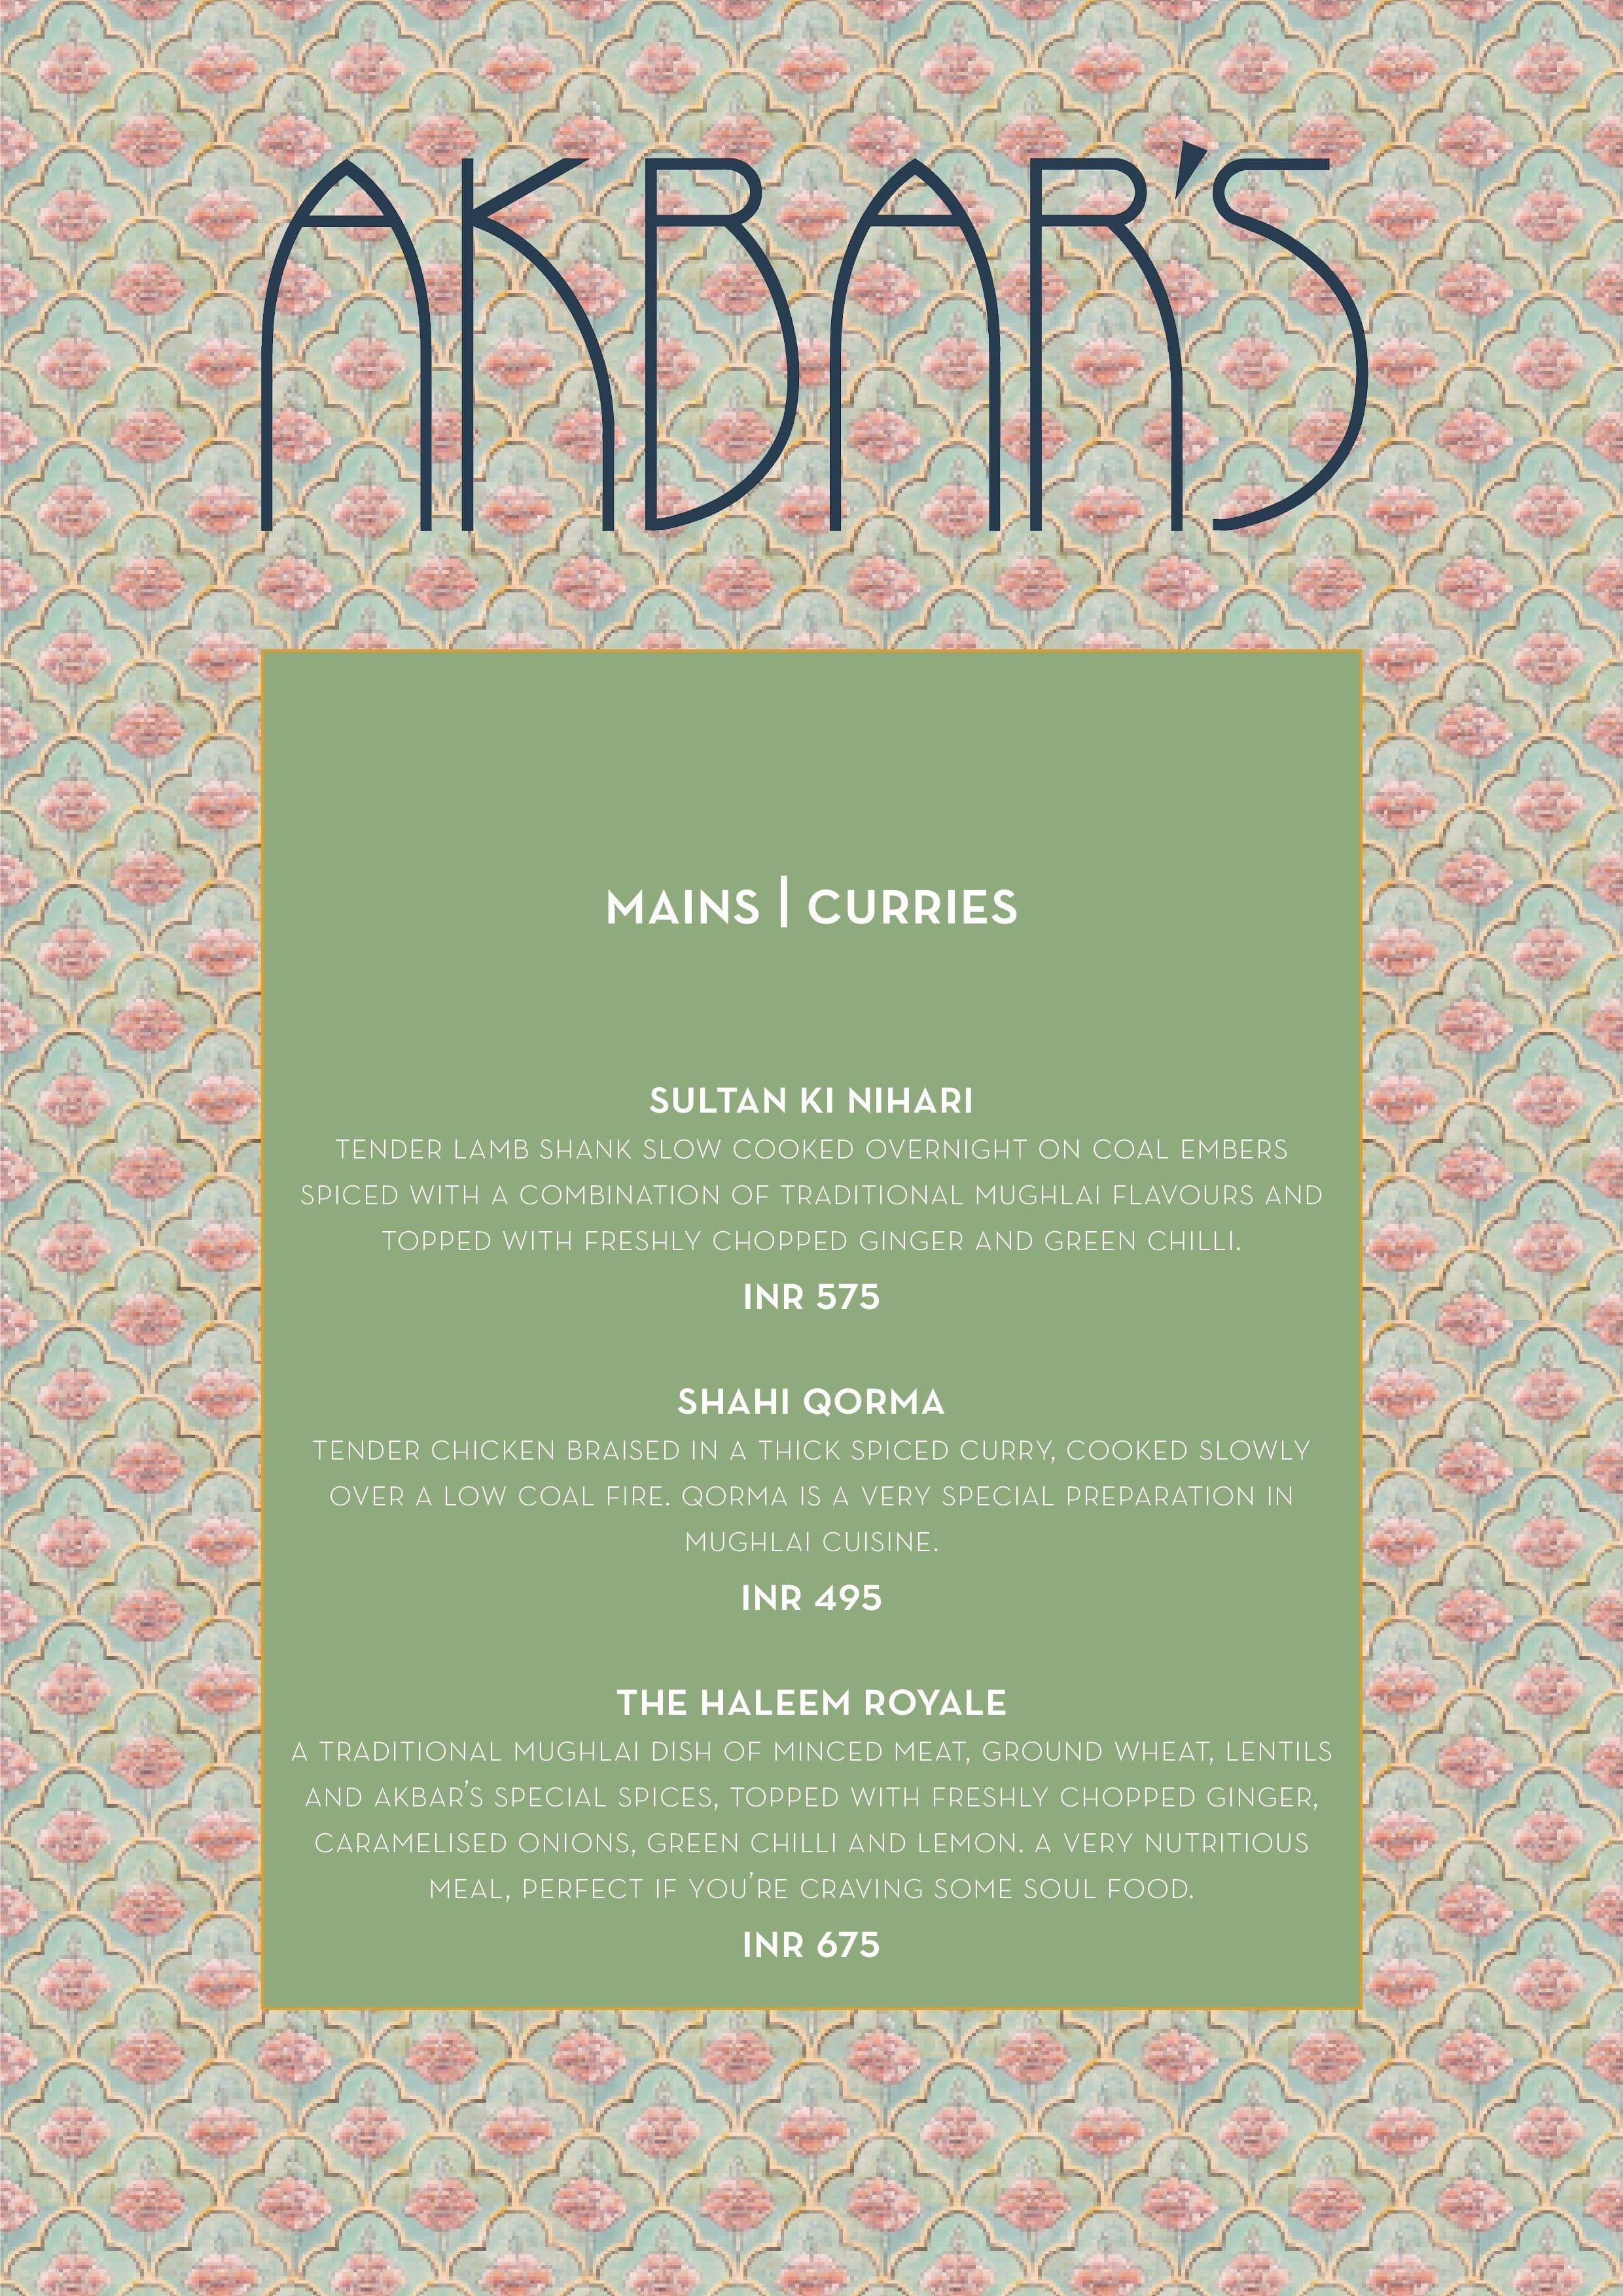 Akbars menu menu for akbars malviya nagar new delhi zomato akbars malviya nagar menu stopboris Image collections